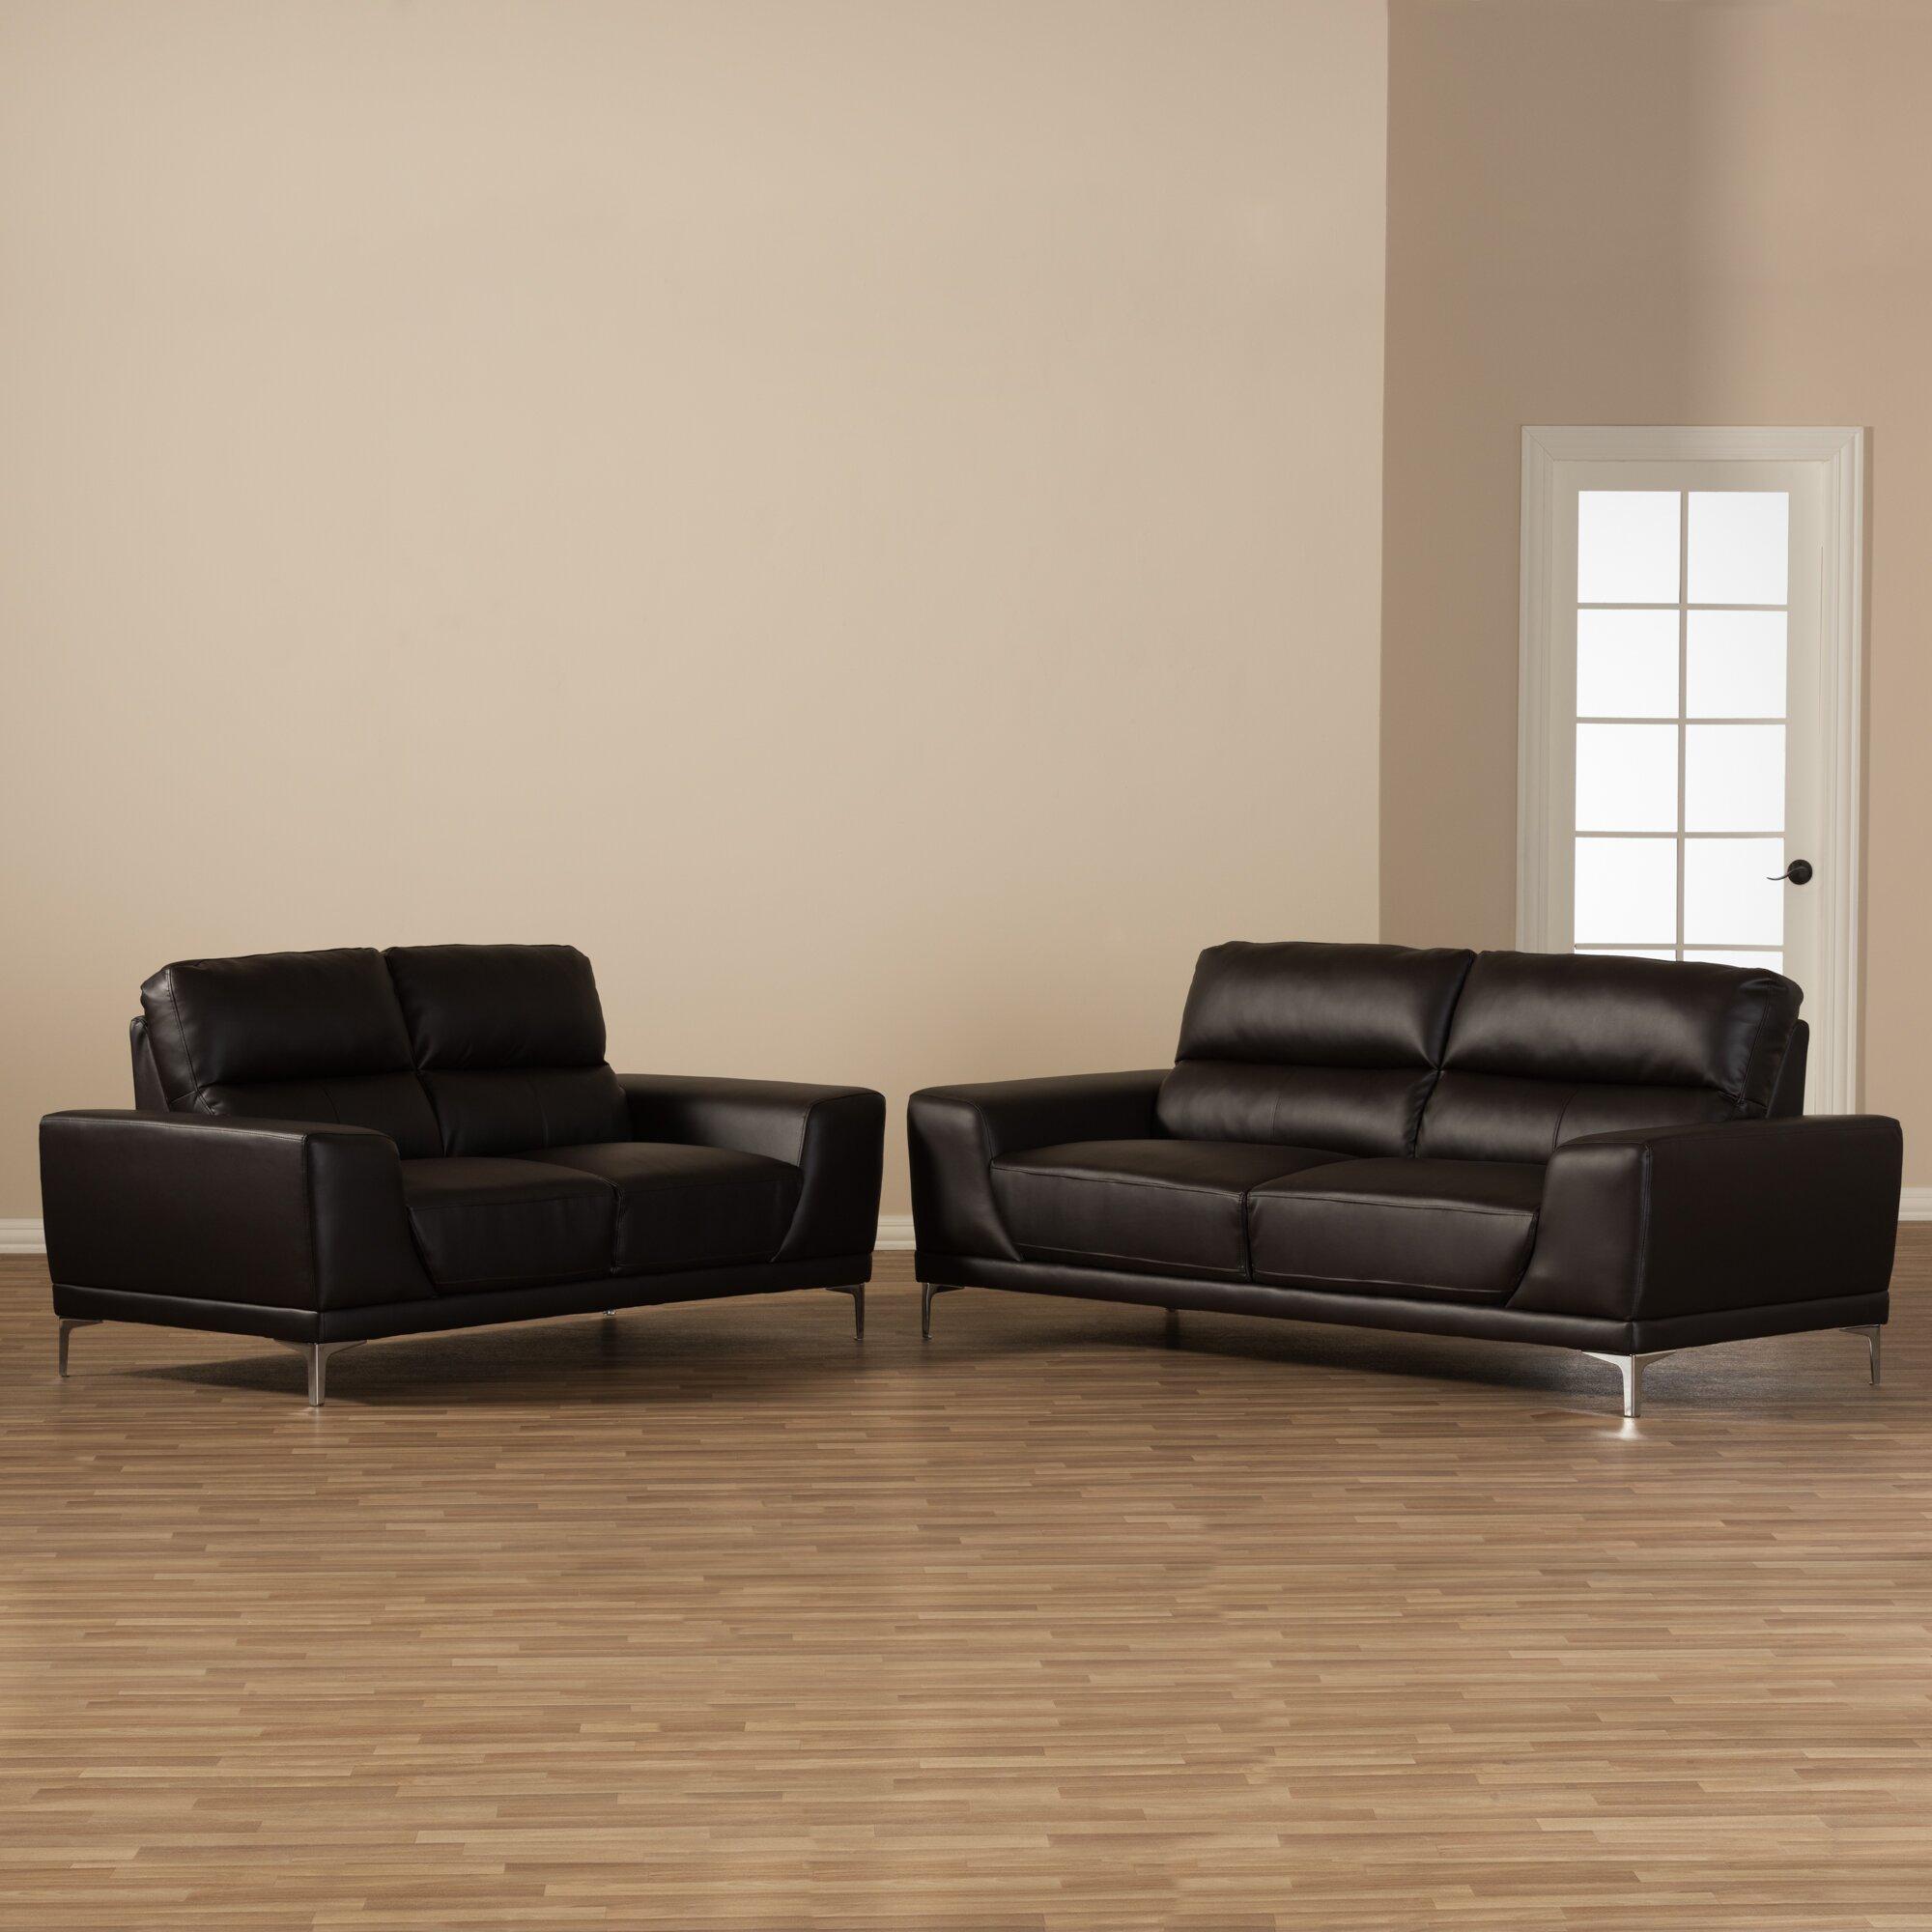 Wholesale interiors baxton studio lambton 2 piece living for 2 piece living room set